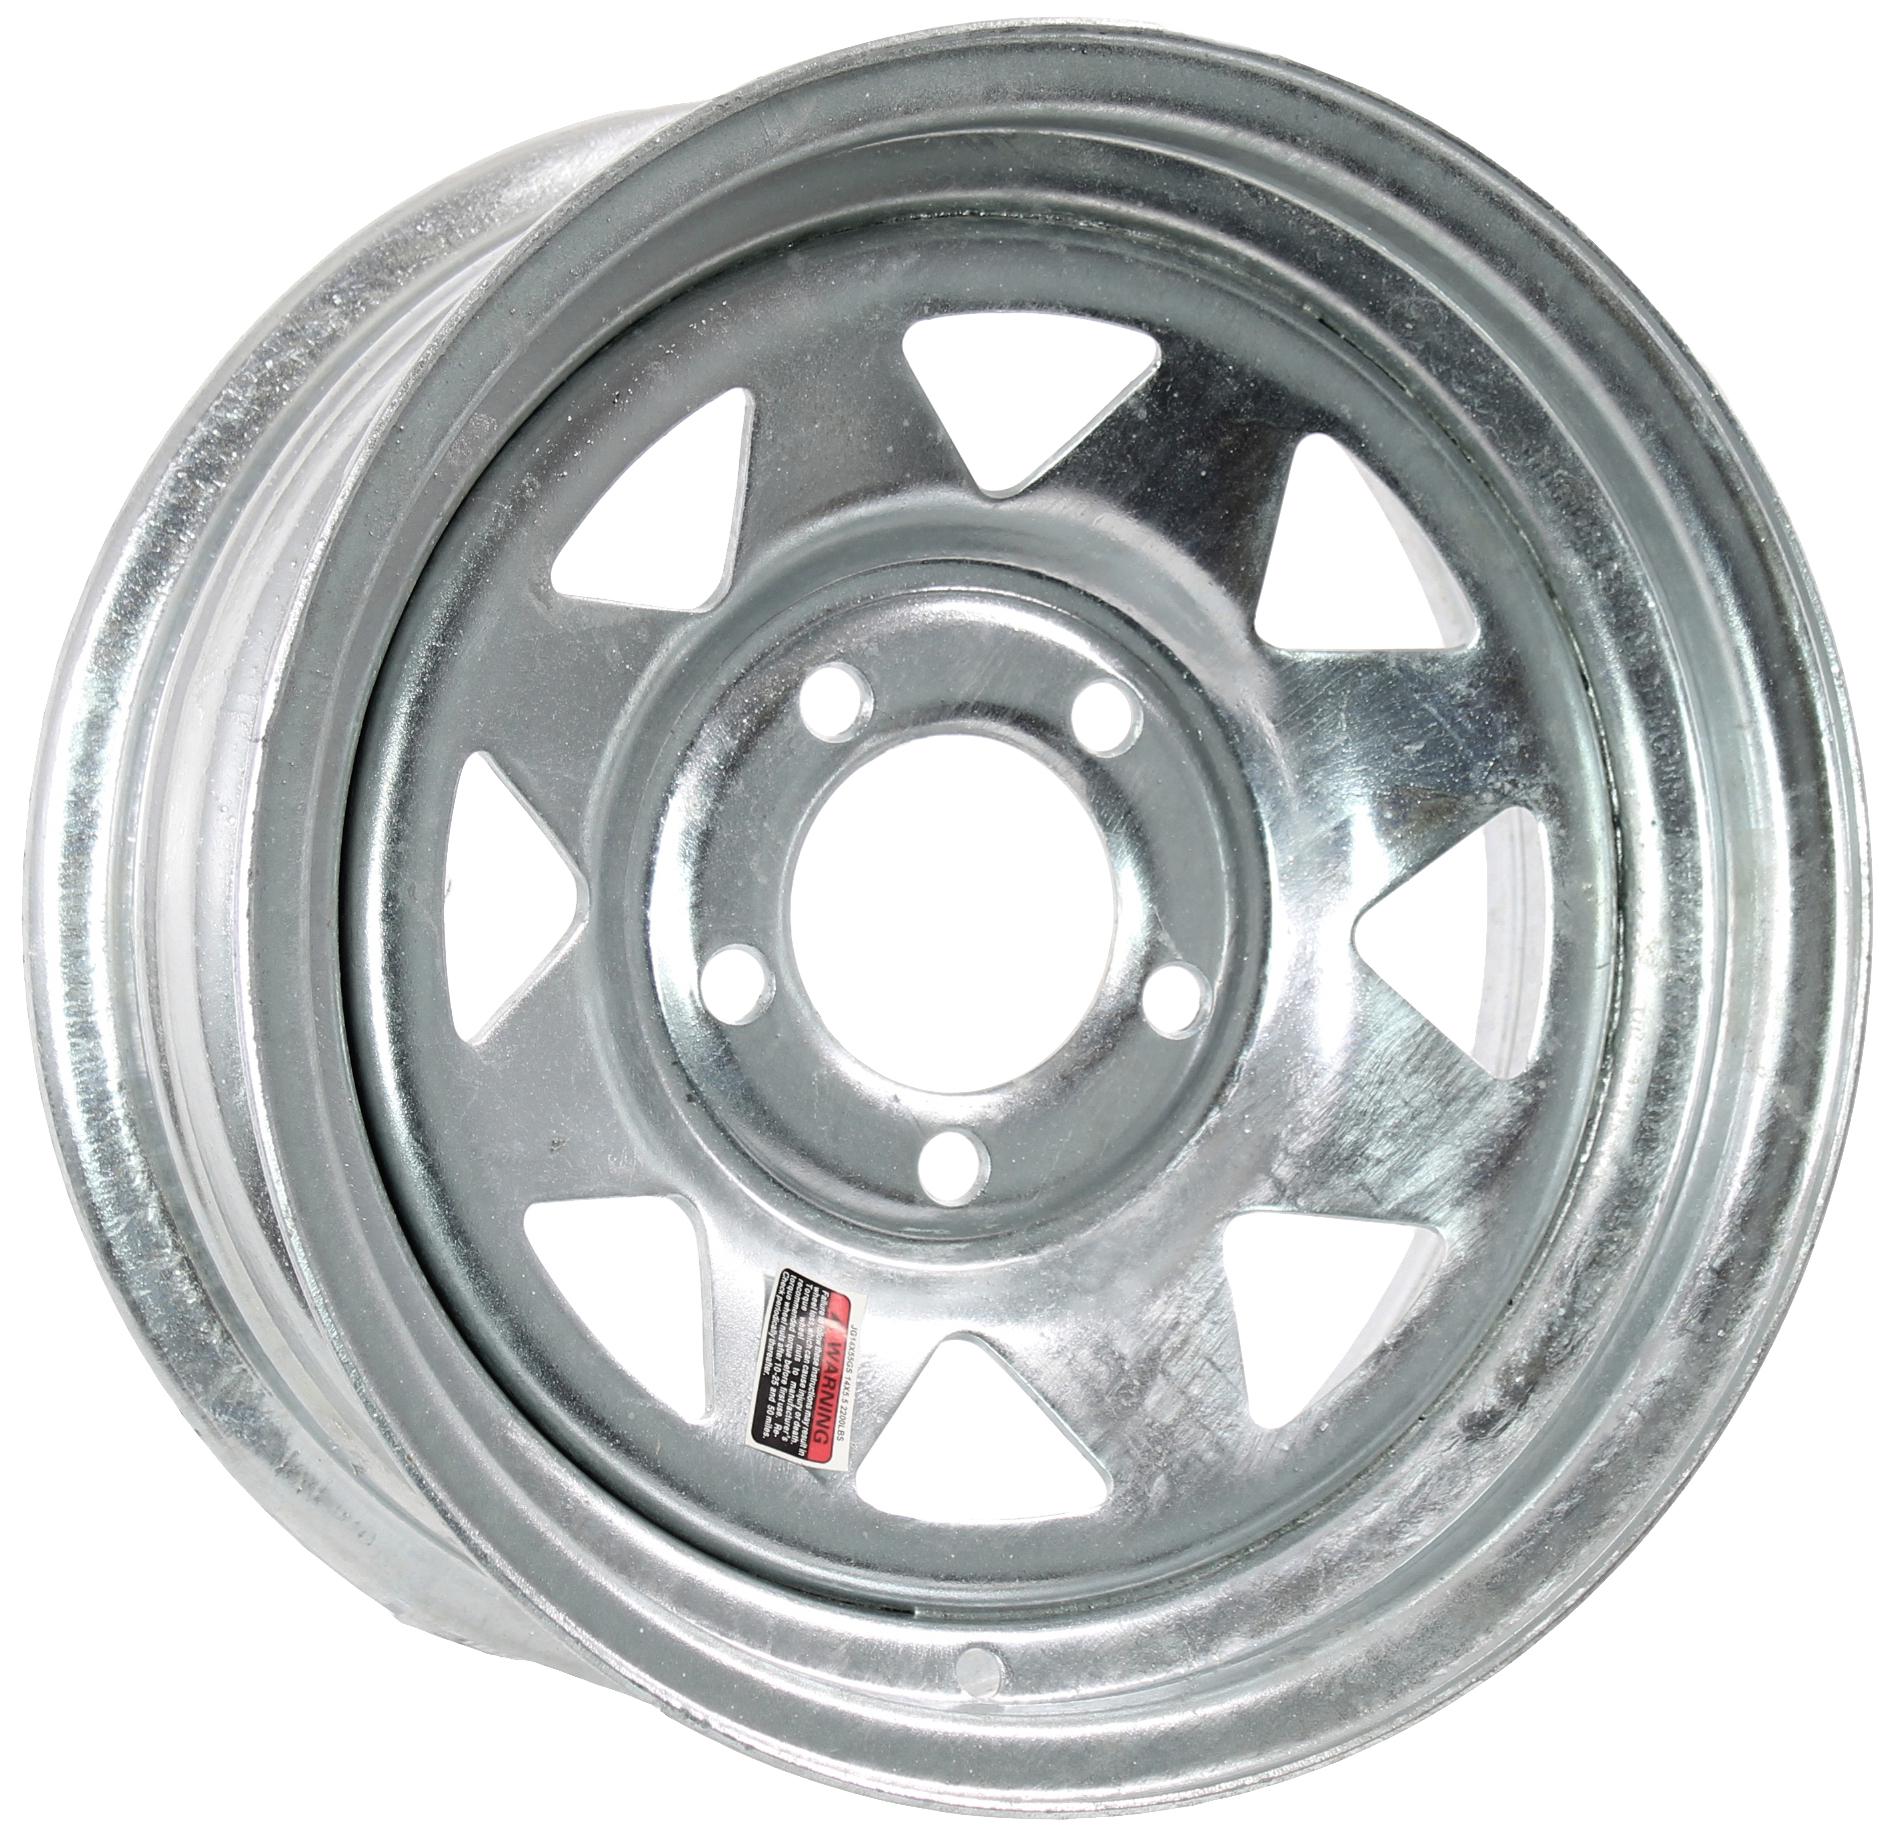 14x5.5 5-Lug Galvanized Spoke Steel Trailer Wheel Image